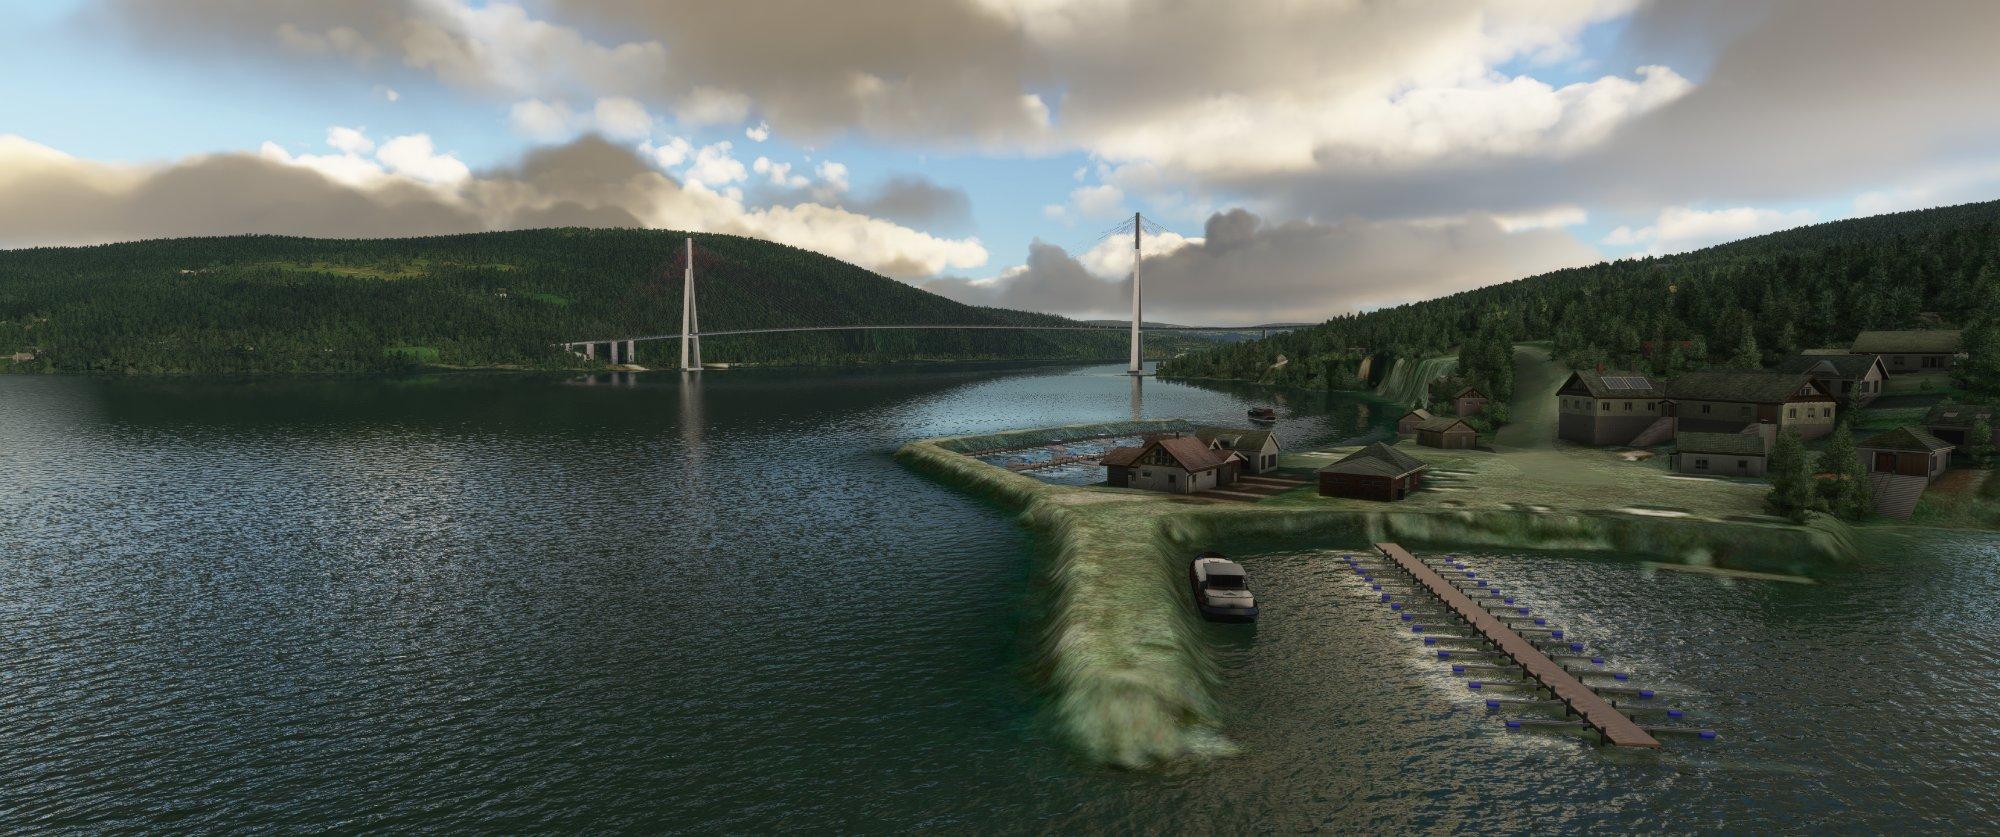 Microsoft Flight Simulator Screenshot 2021.05.18 - 22.30.27.76.jpg